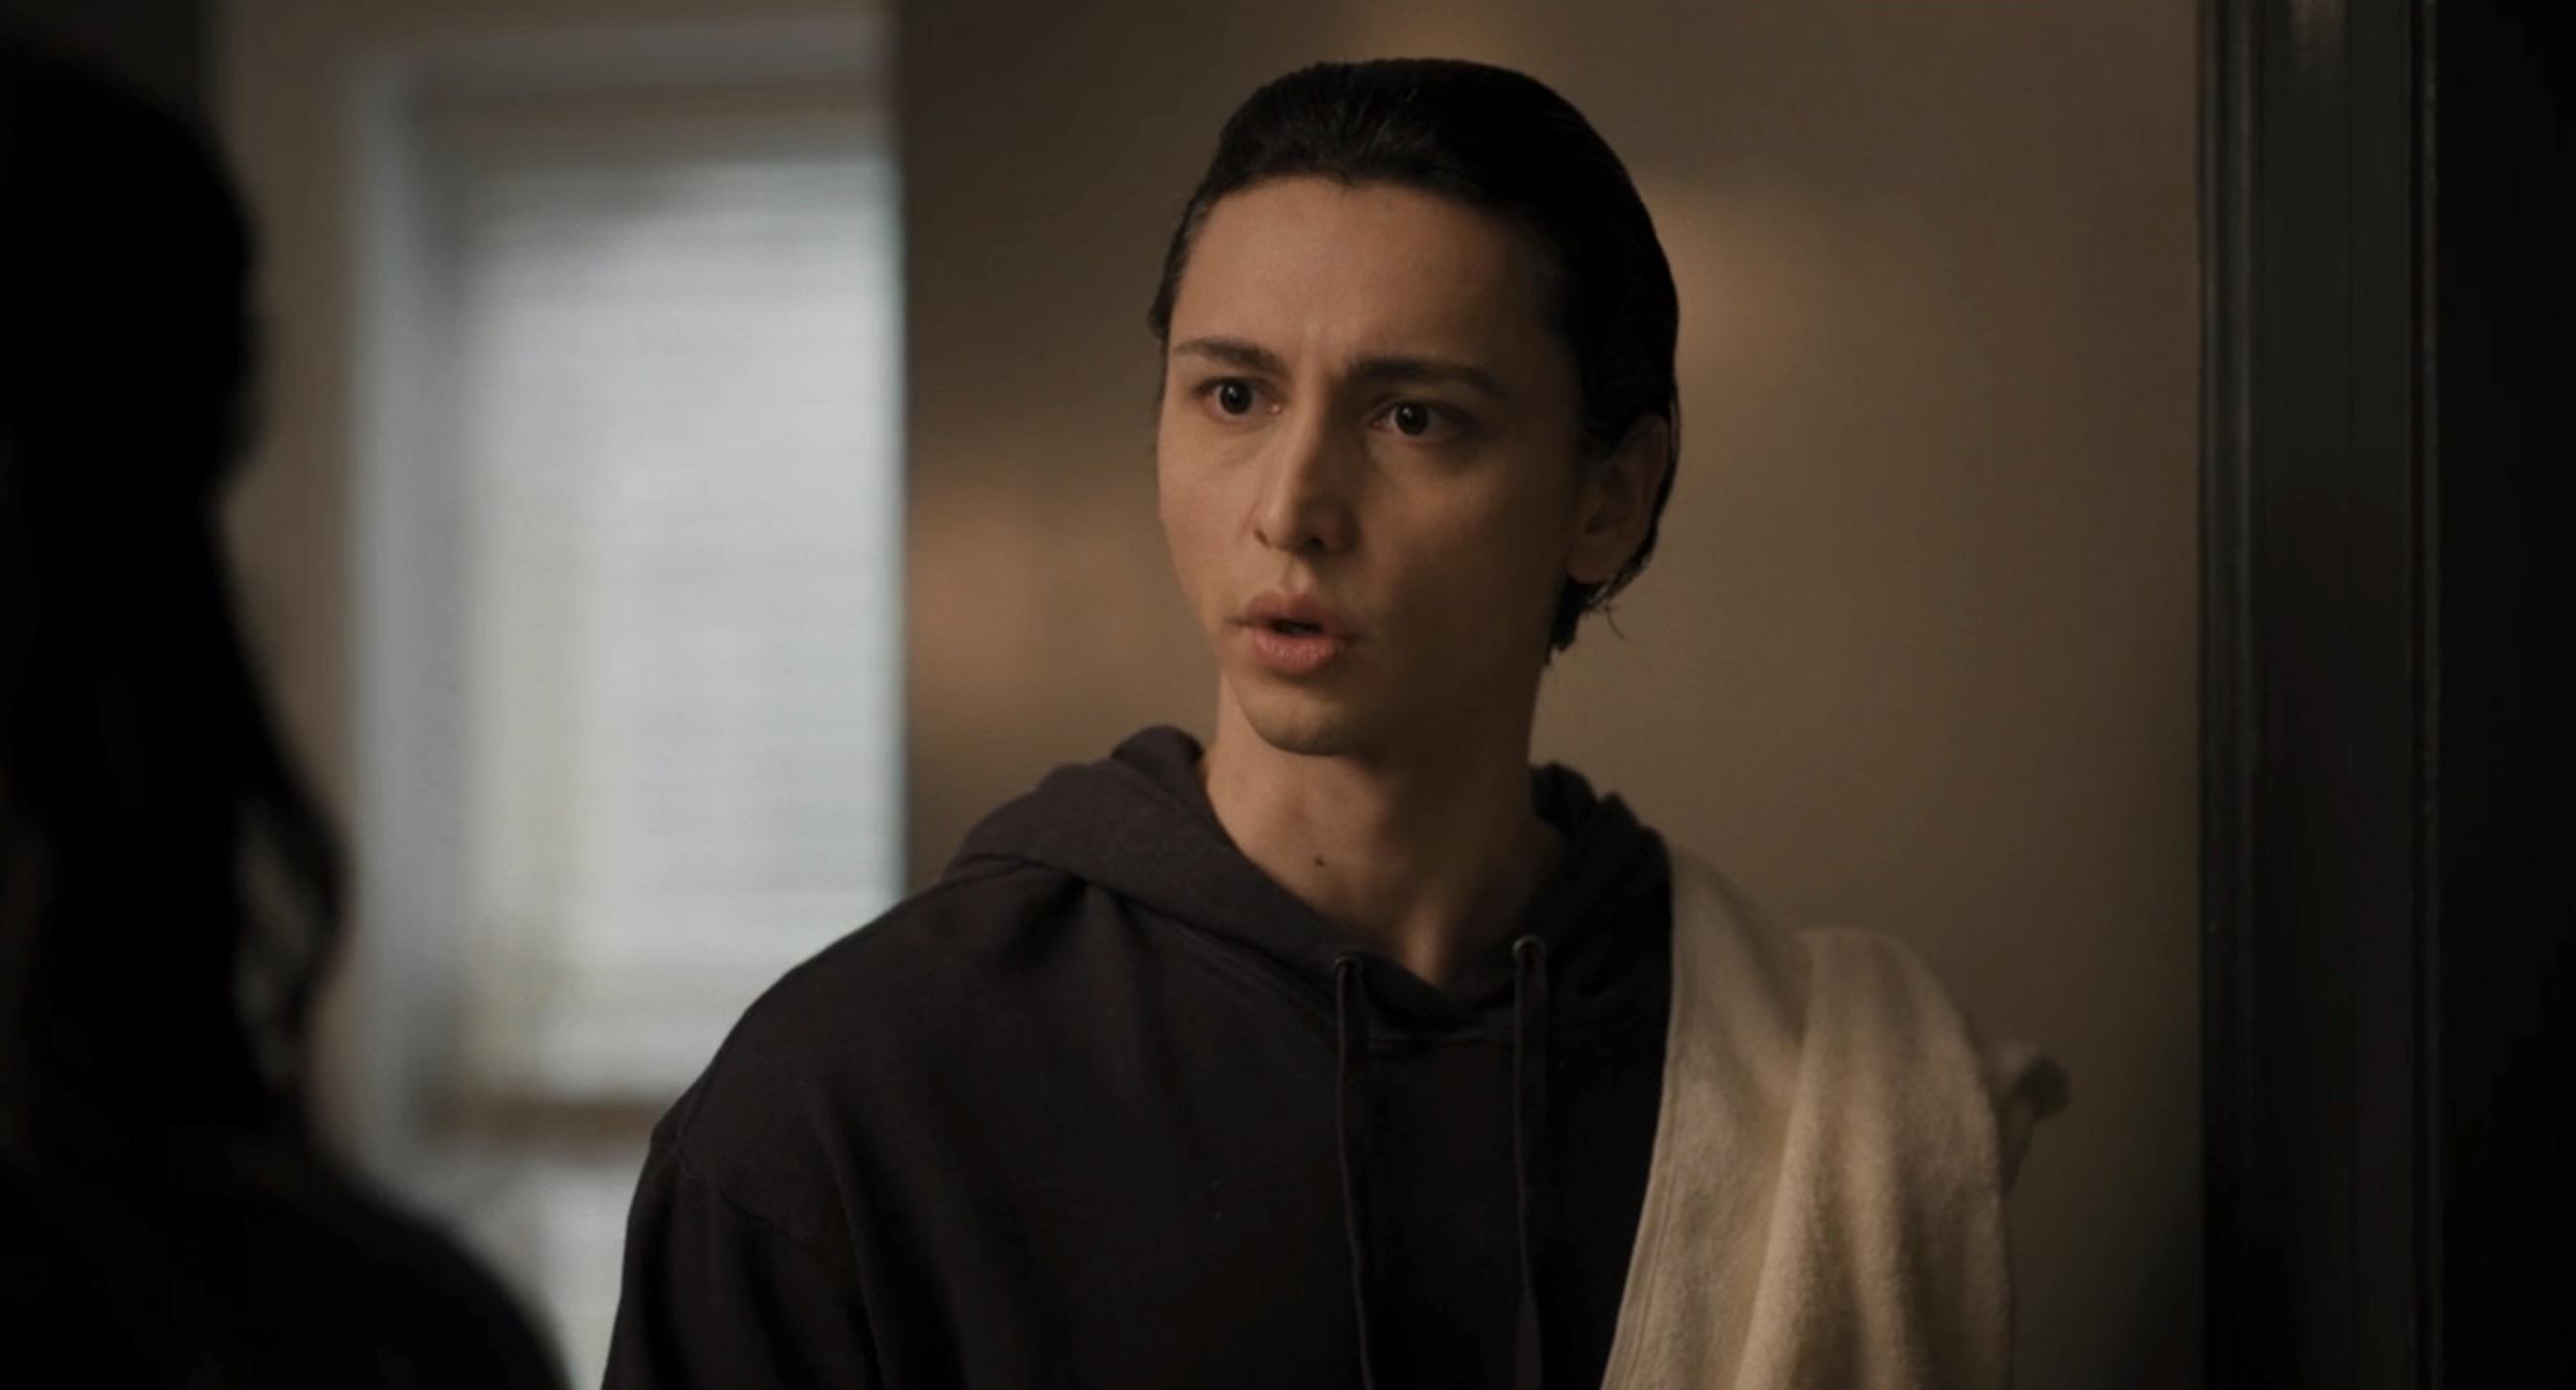 Only Murders in the Building Cast on Hulu - Julian Cihi as Tim Kono - Vague Visages